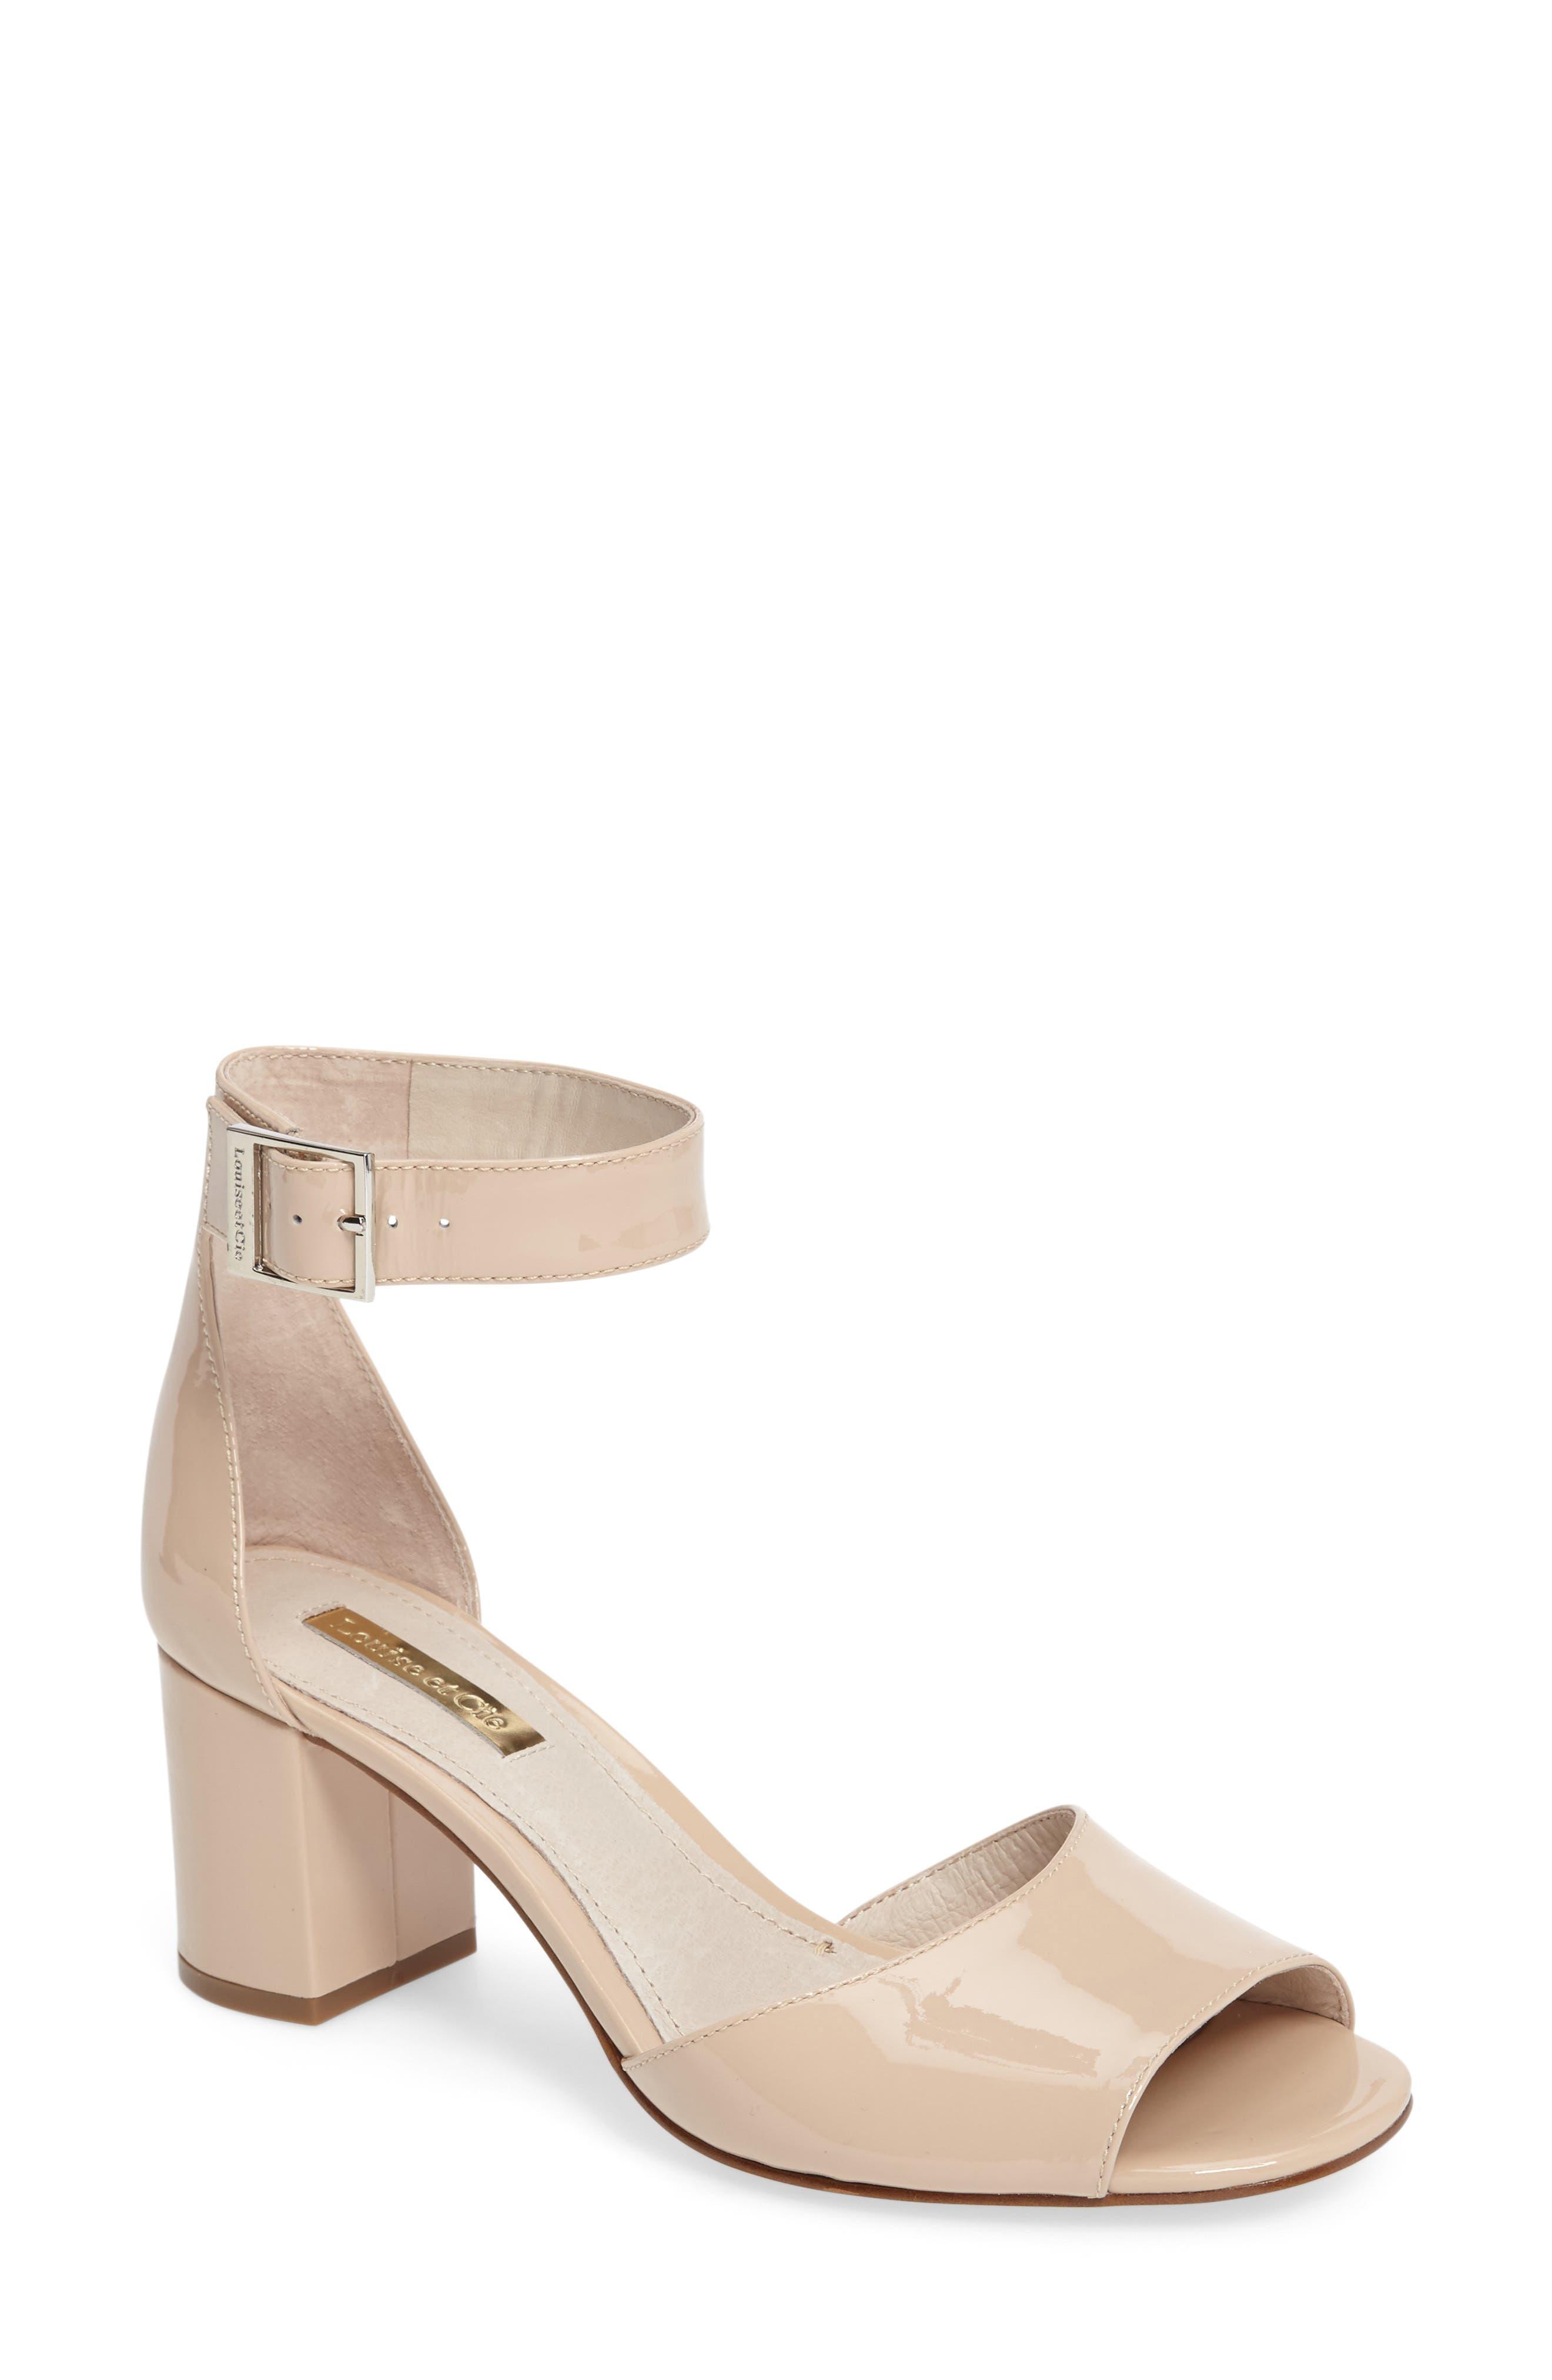 Karisa Ankle Cuff Sandal,                         Main,                         color, Angel Food Patent